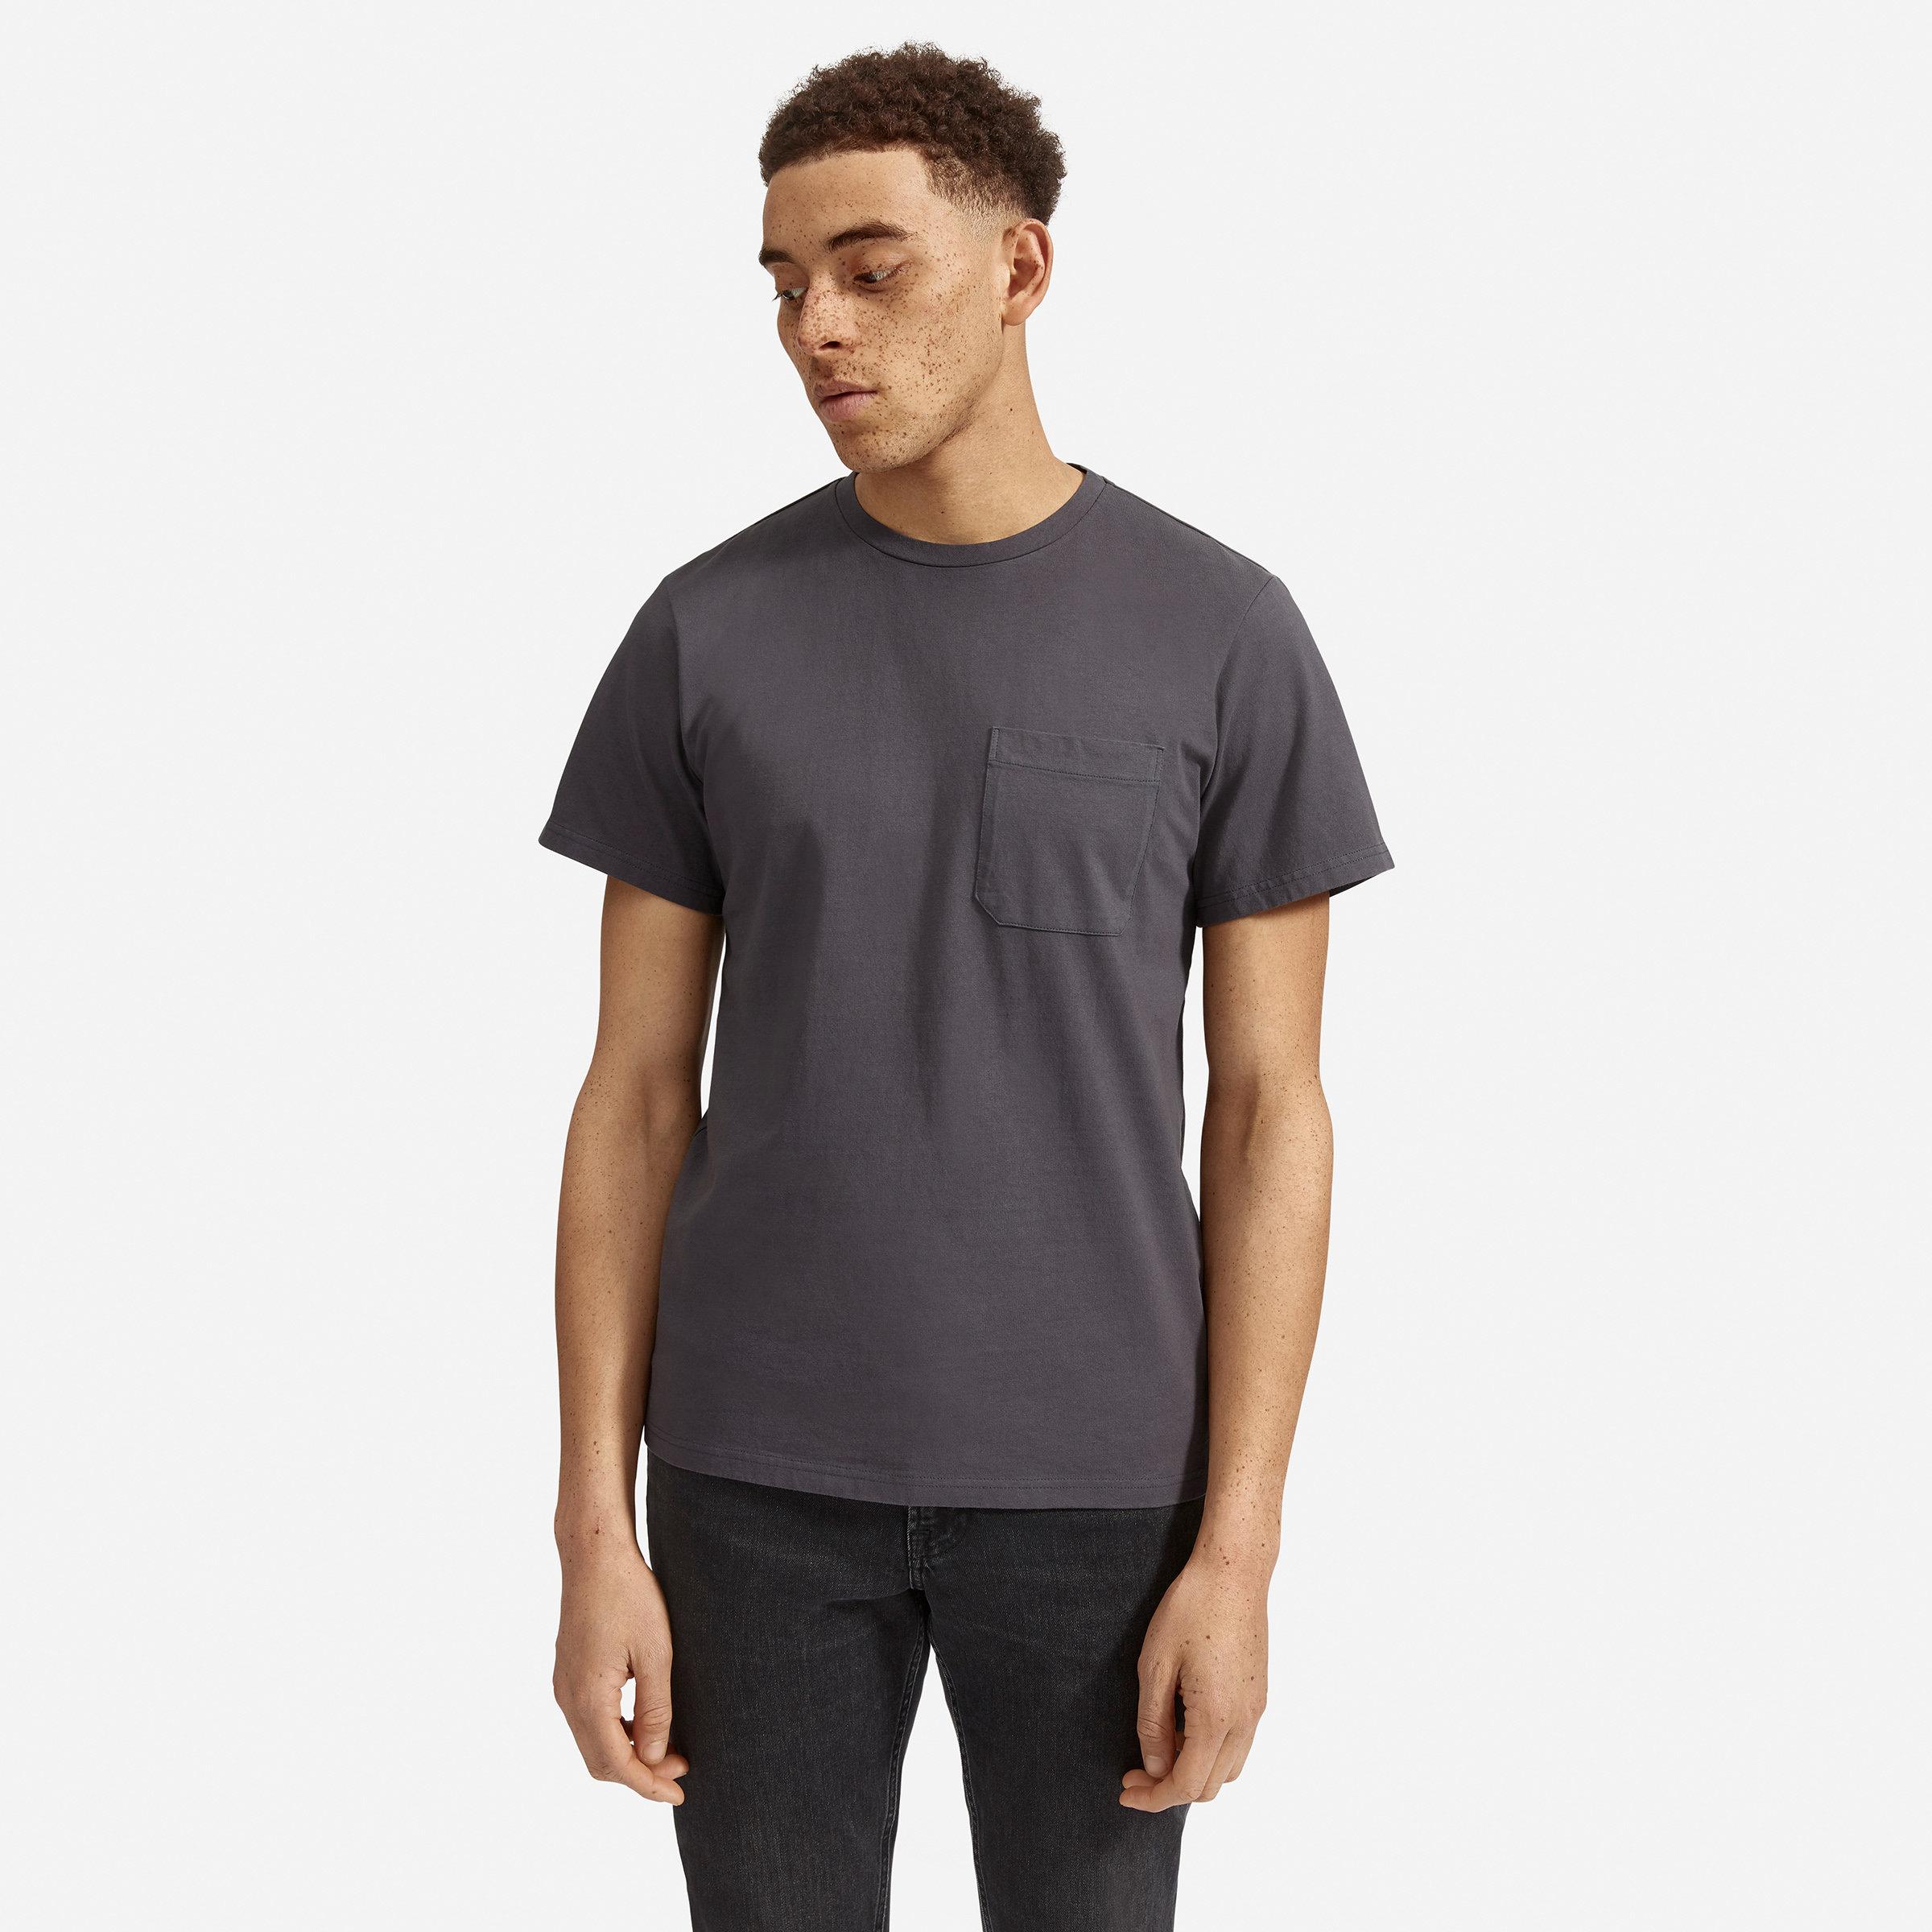 66690097420a Men's Tees: V-Neck, Crew, & Short Sleeve T-Shirts for Men | Everlane